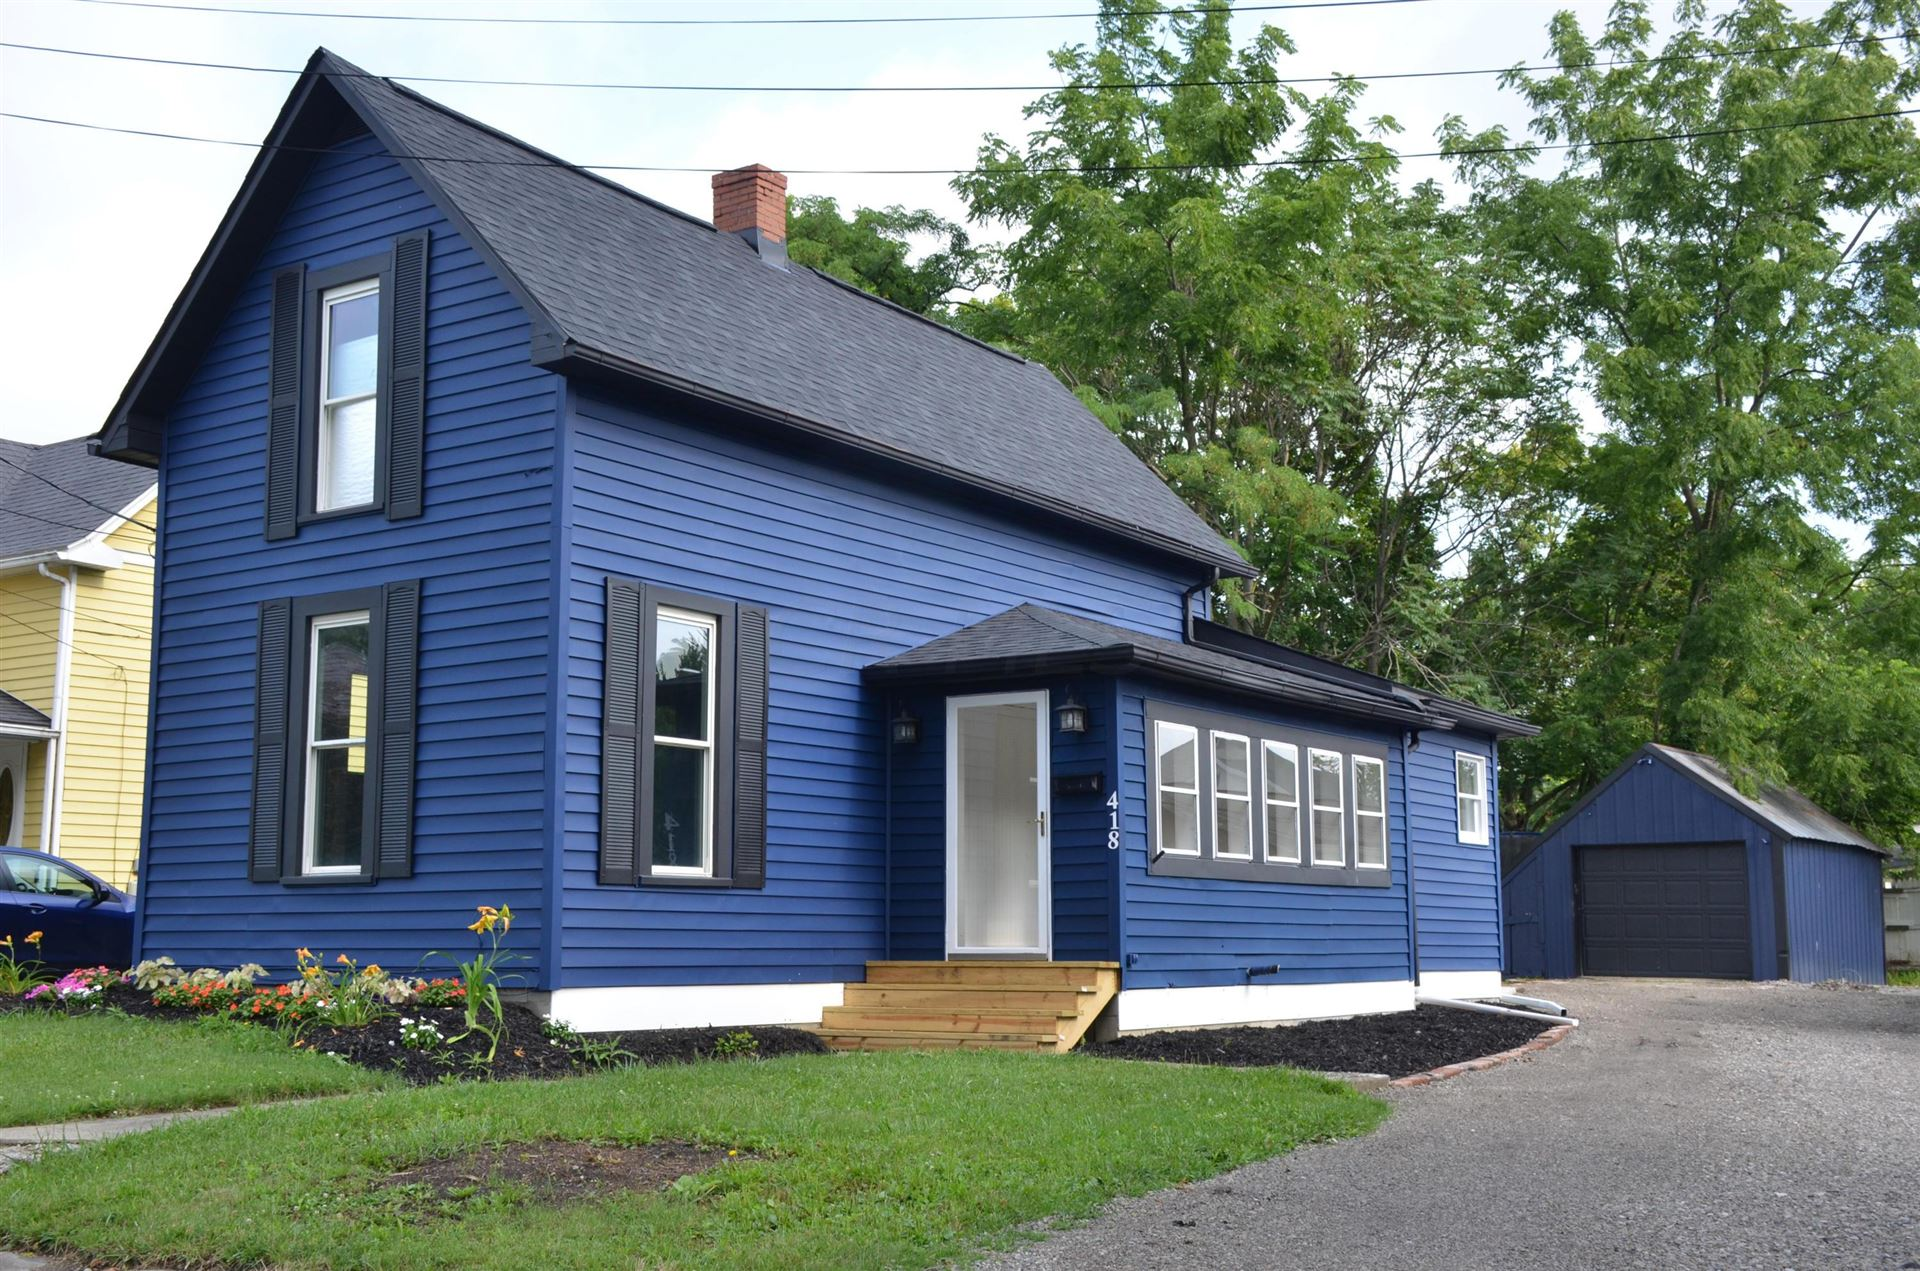 418 W 7th Street, Marysville, OH 43040 - MLS#: 221026338